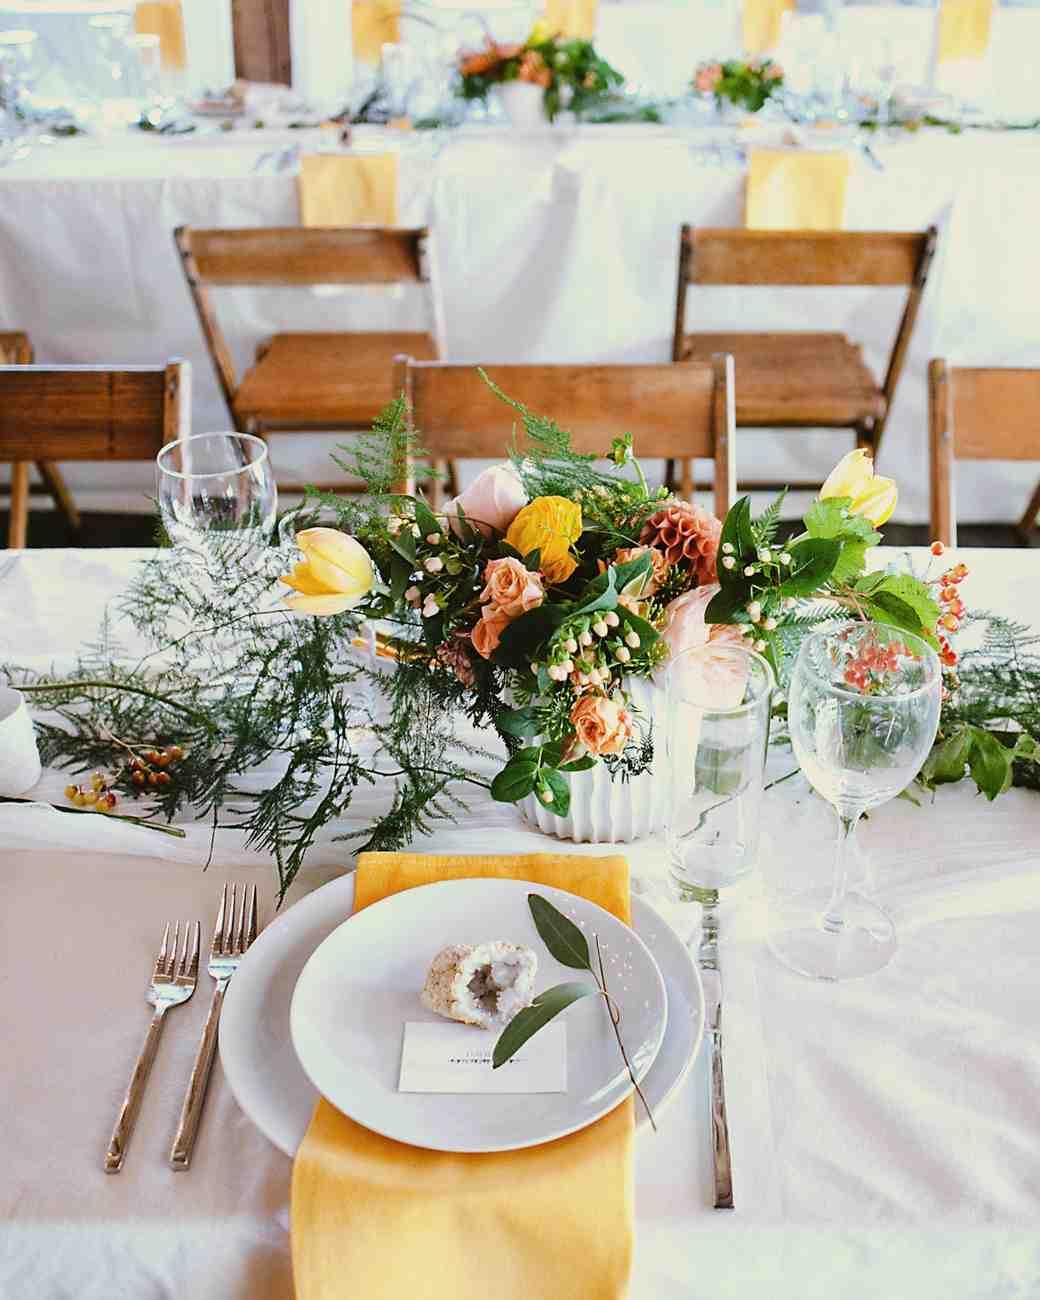 cat-vince-wedding-table-033-s112646-0216.jpg